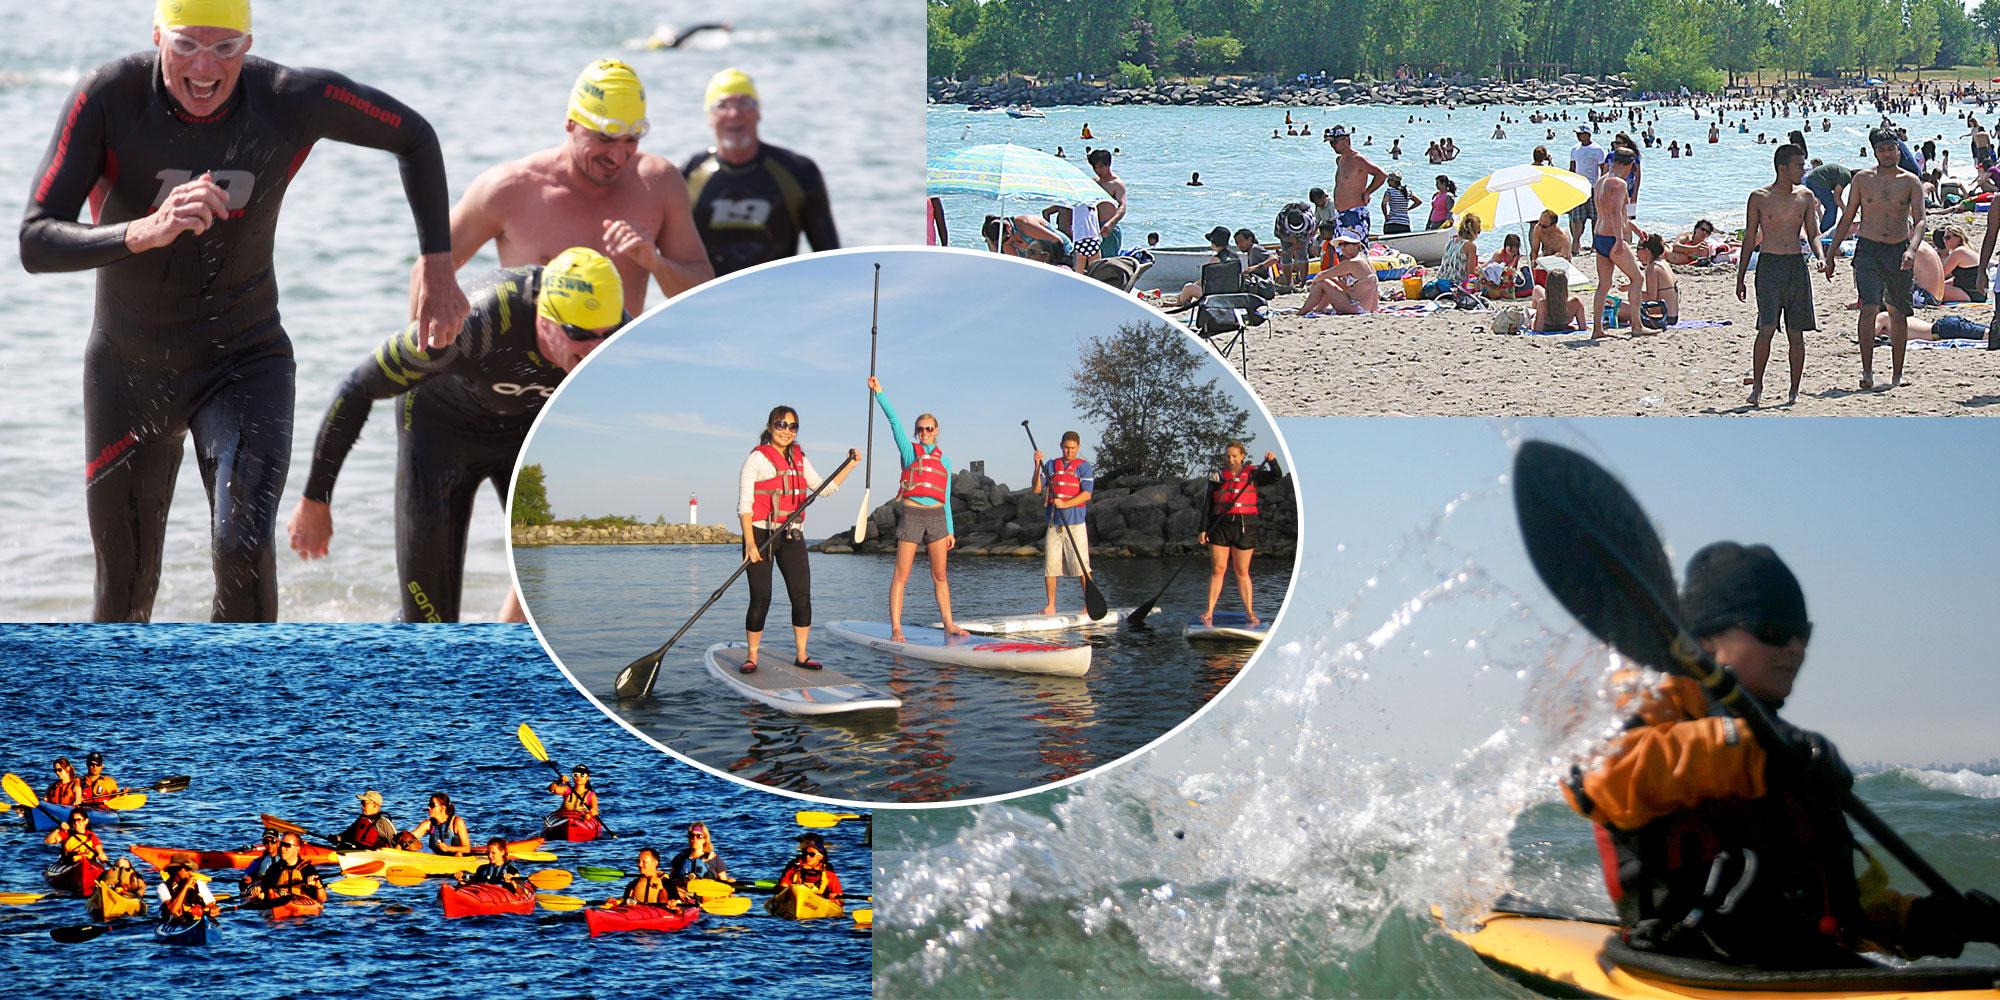 Photos via Lake Ontario Waterkeeper and Rob Campbell .